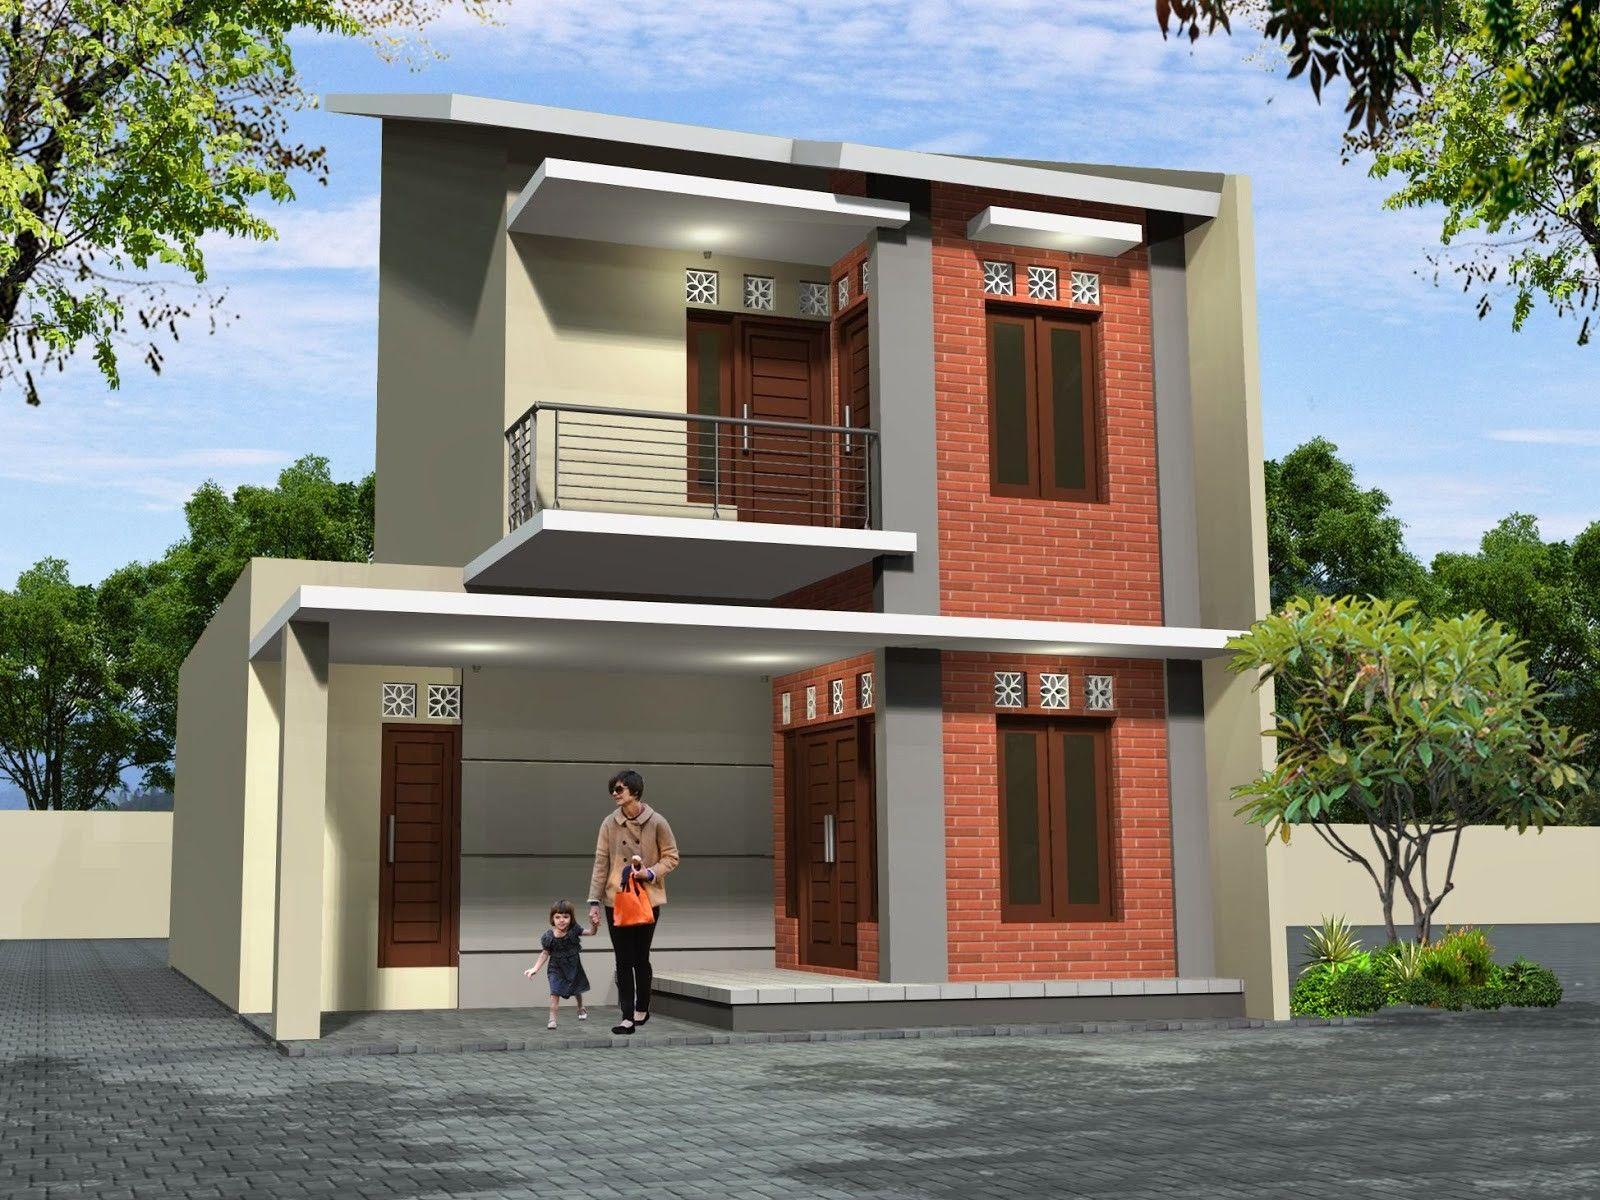 Contoh Rumah Minimalis Tingkat Dua Inspiratif